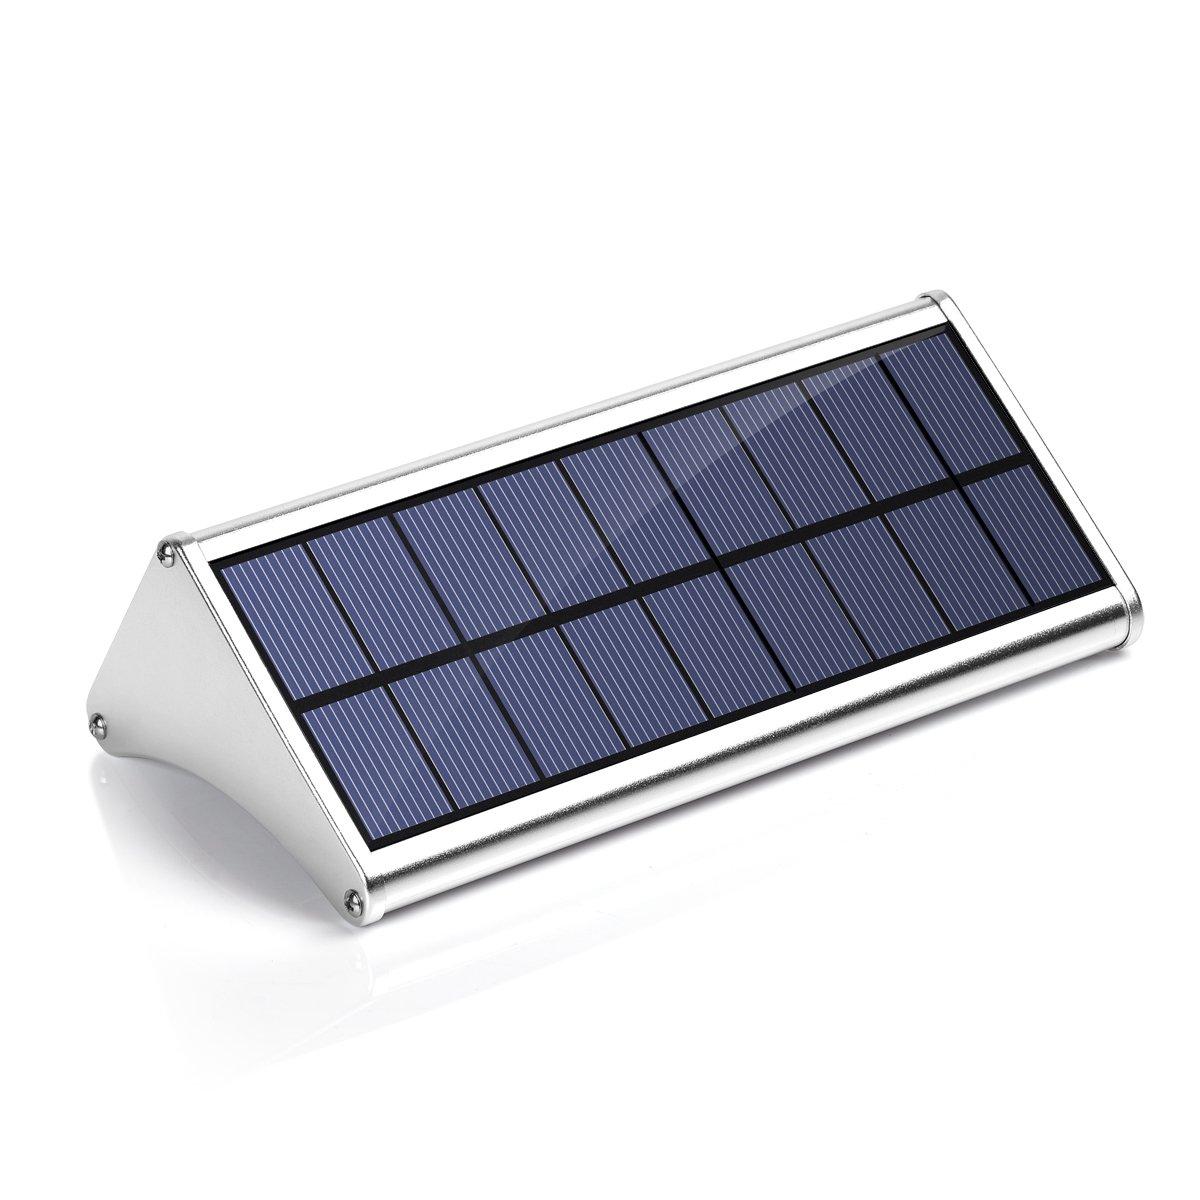 Solar Lights Outdoor- 900 Lumens 48 LEDs Aluminum Alloy Housing Wall Light- 360° Radar Motion Sensor & Multiple Intelligent Light Modes, Wall Sconces Waterproof Security for Garden Yard, Path